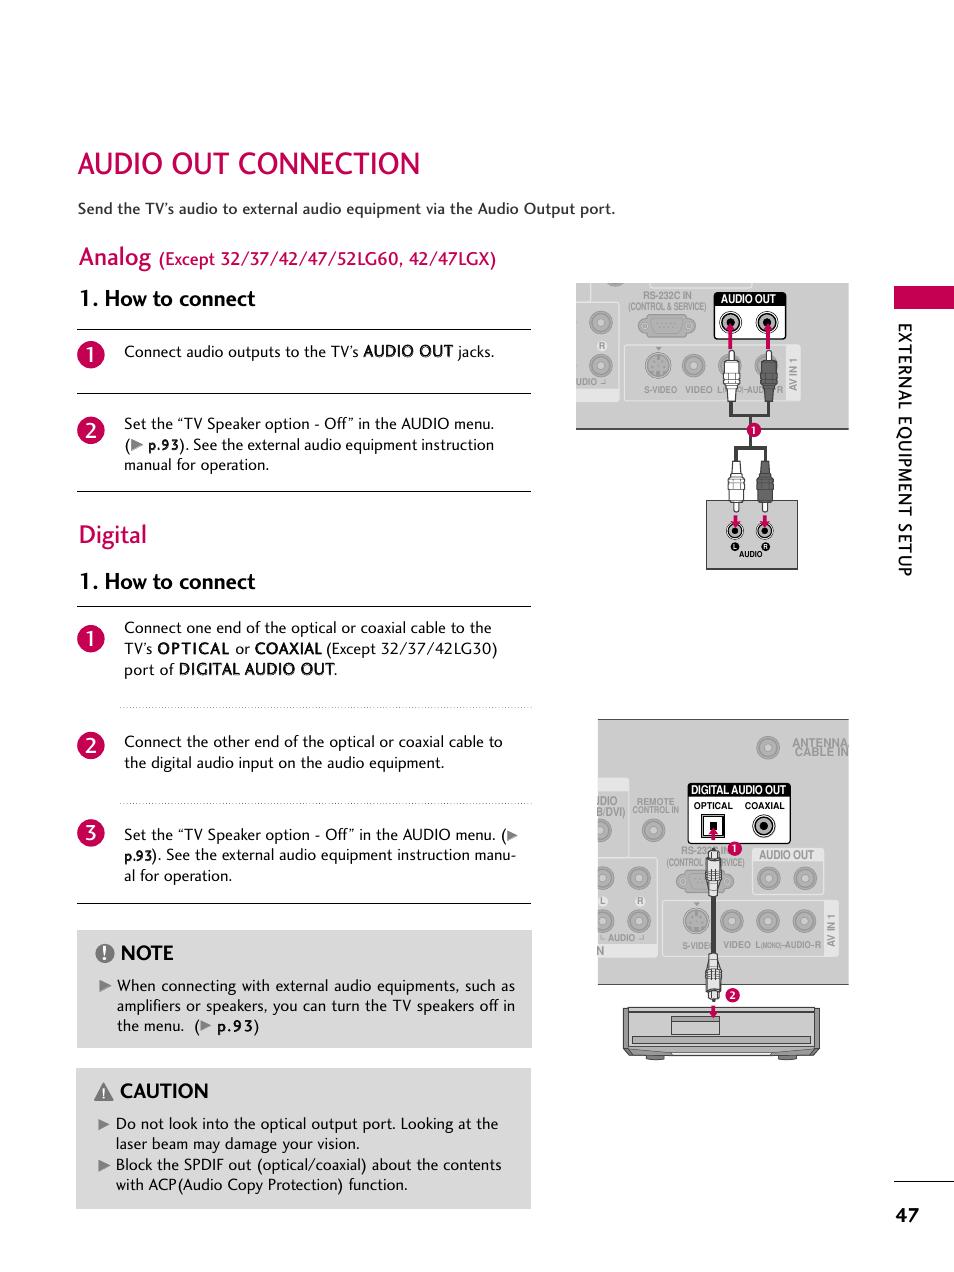 audio out connection analog digital lg 42lg30 ud user manual rh manualsdir com LG Smart TV 42LG30 Problems